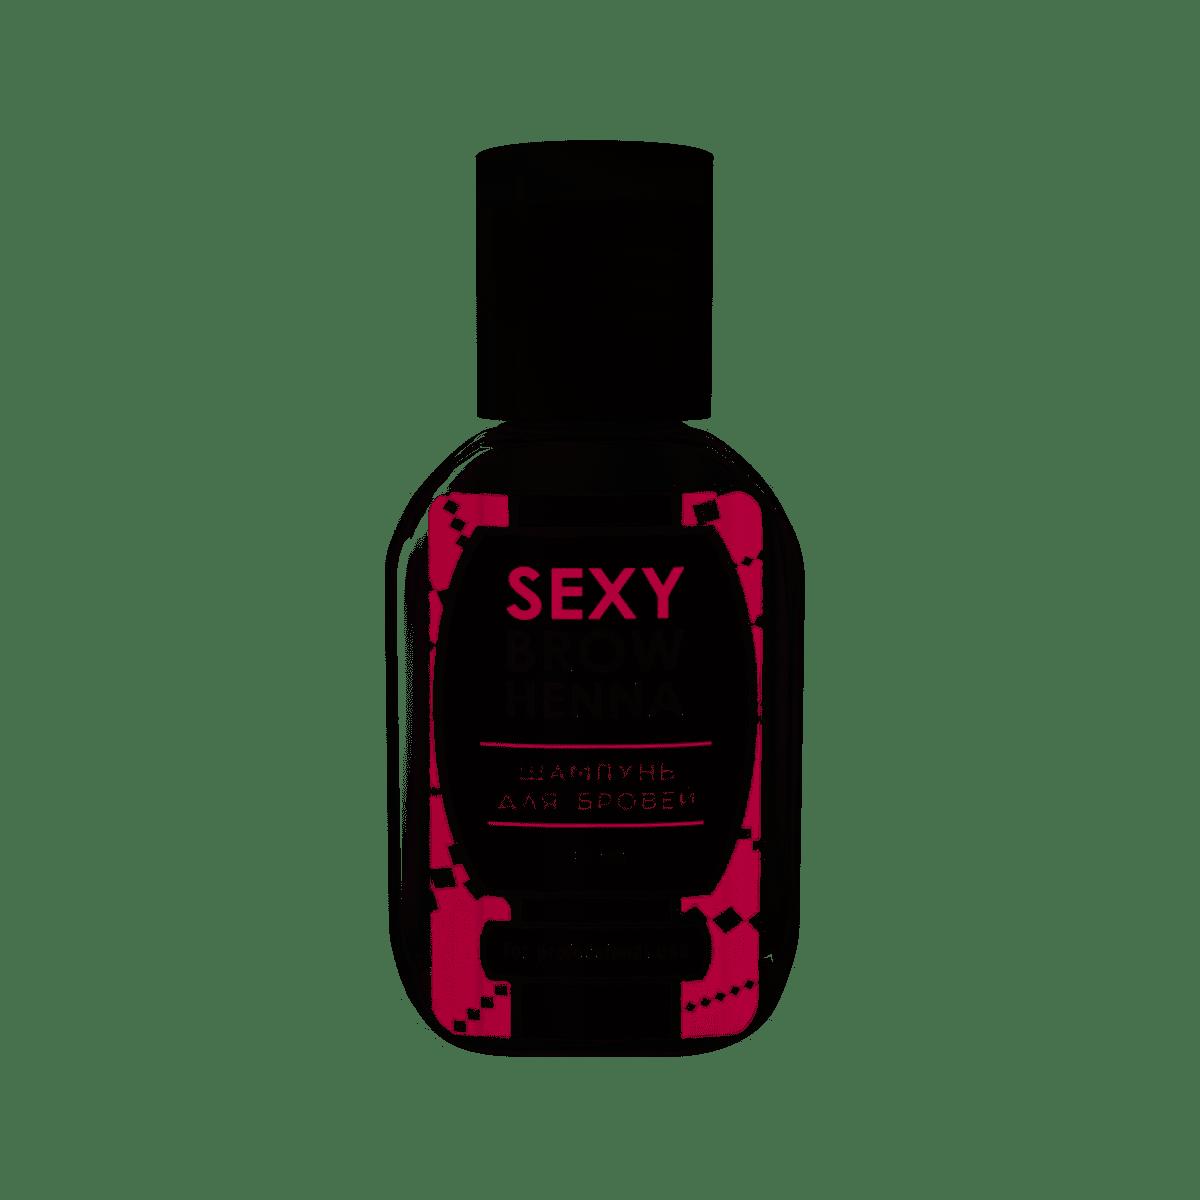 Шампунь для бровей SEXY BROW HENNA, 30мл